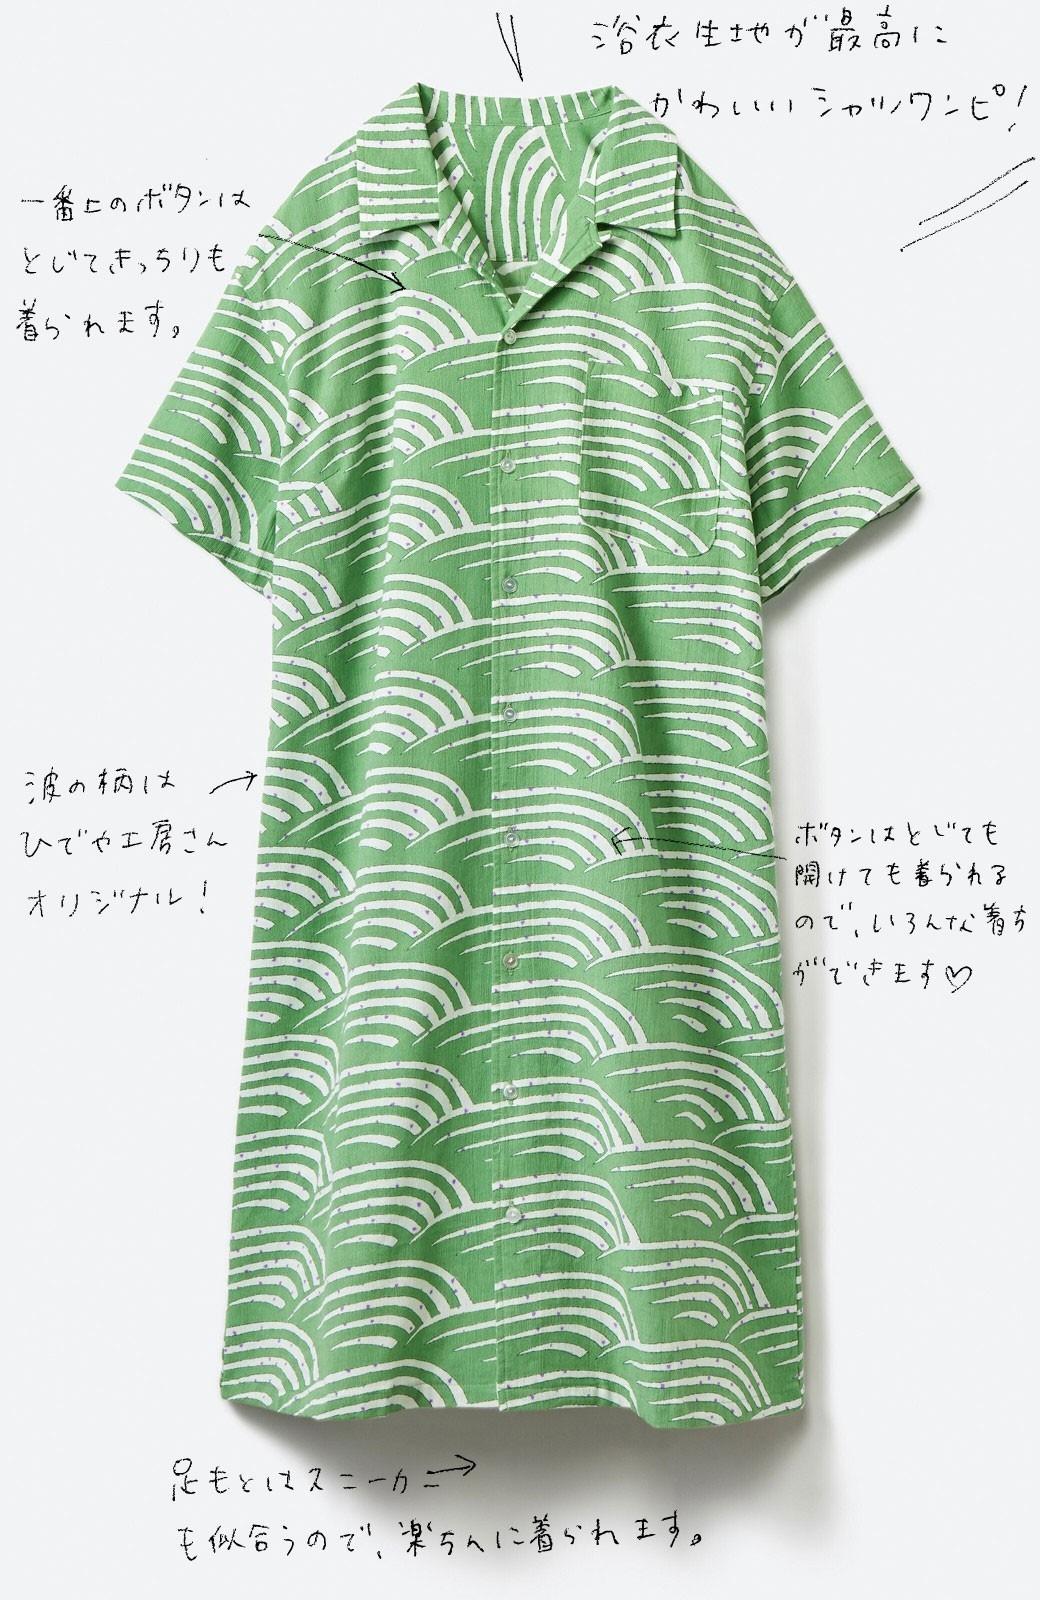 haco! 京都の浴衣屋さんと作った浴衣生地のシャツワンピース <グリーン>の商品写真2